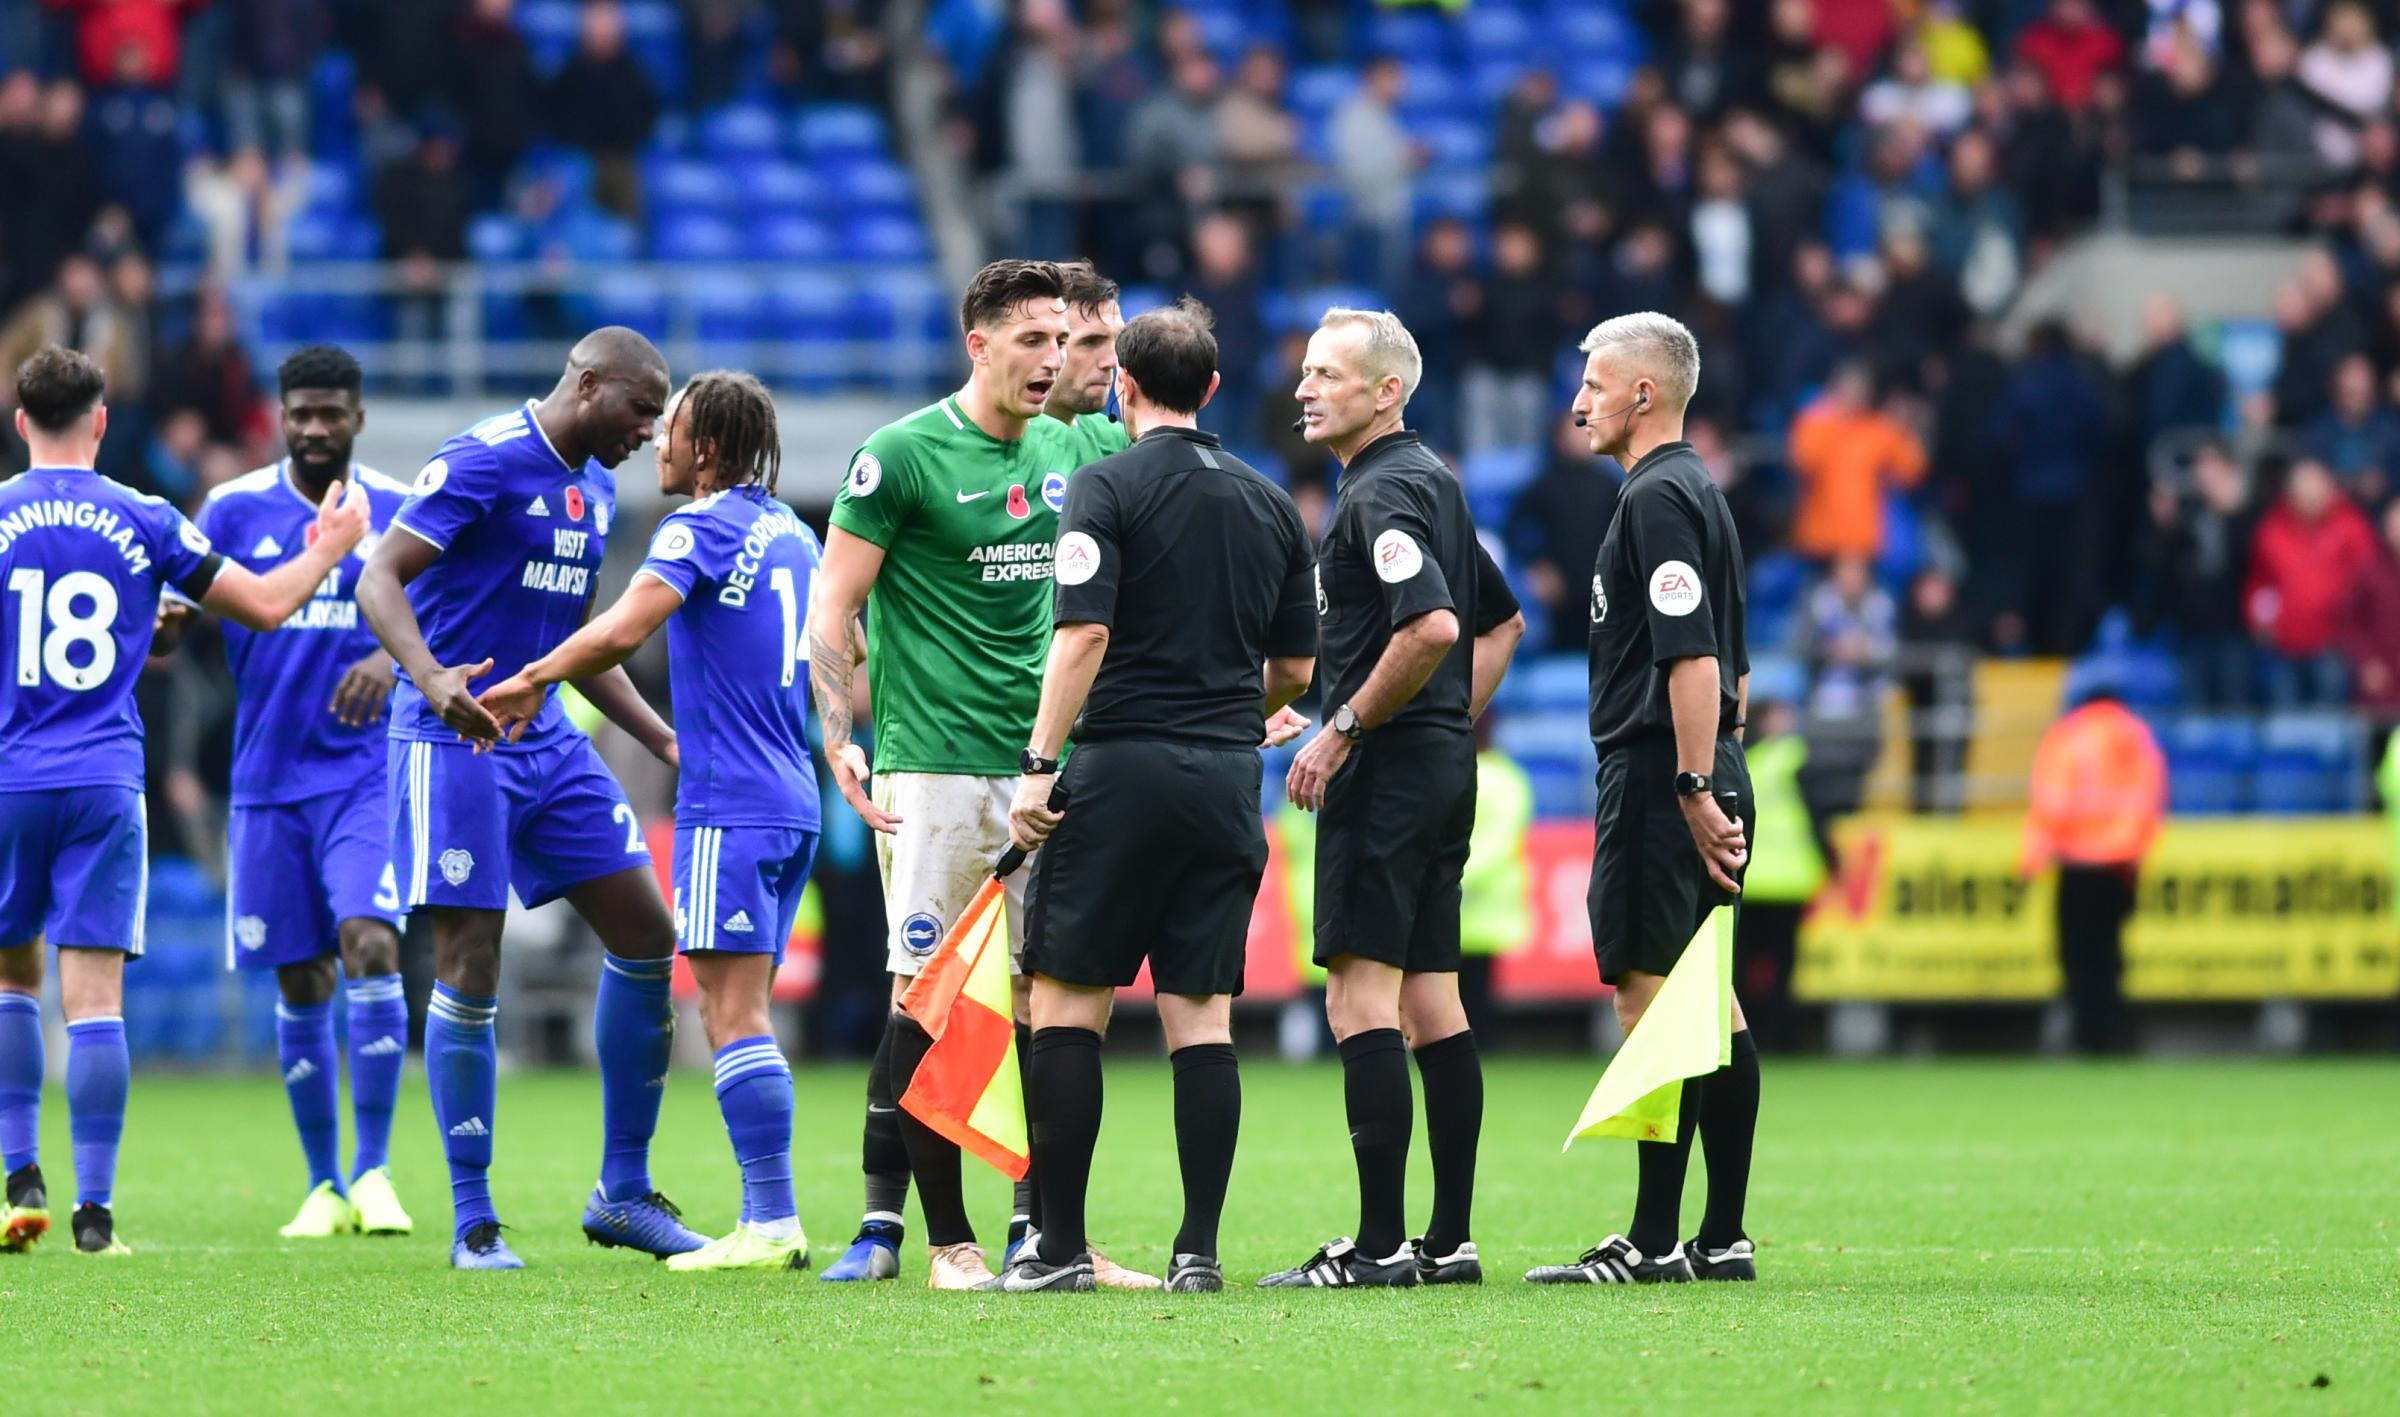 Albion Analysis: Cardiff winner highlights need for VAR